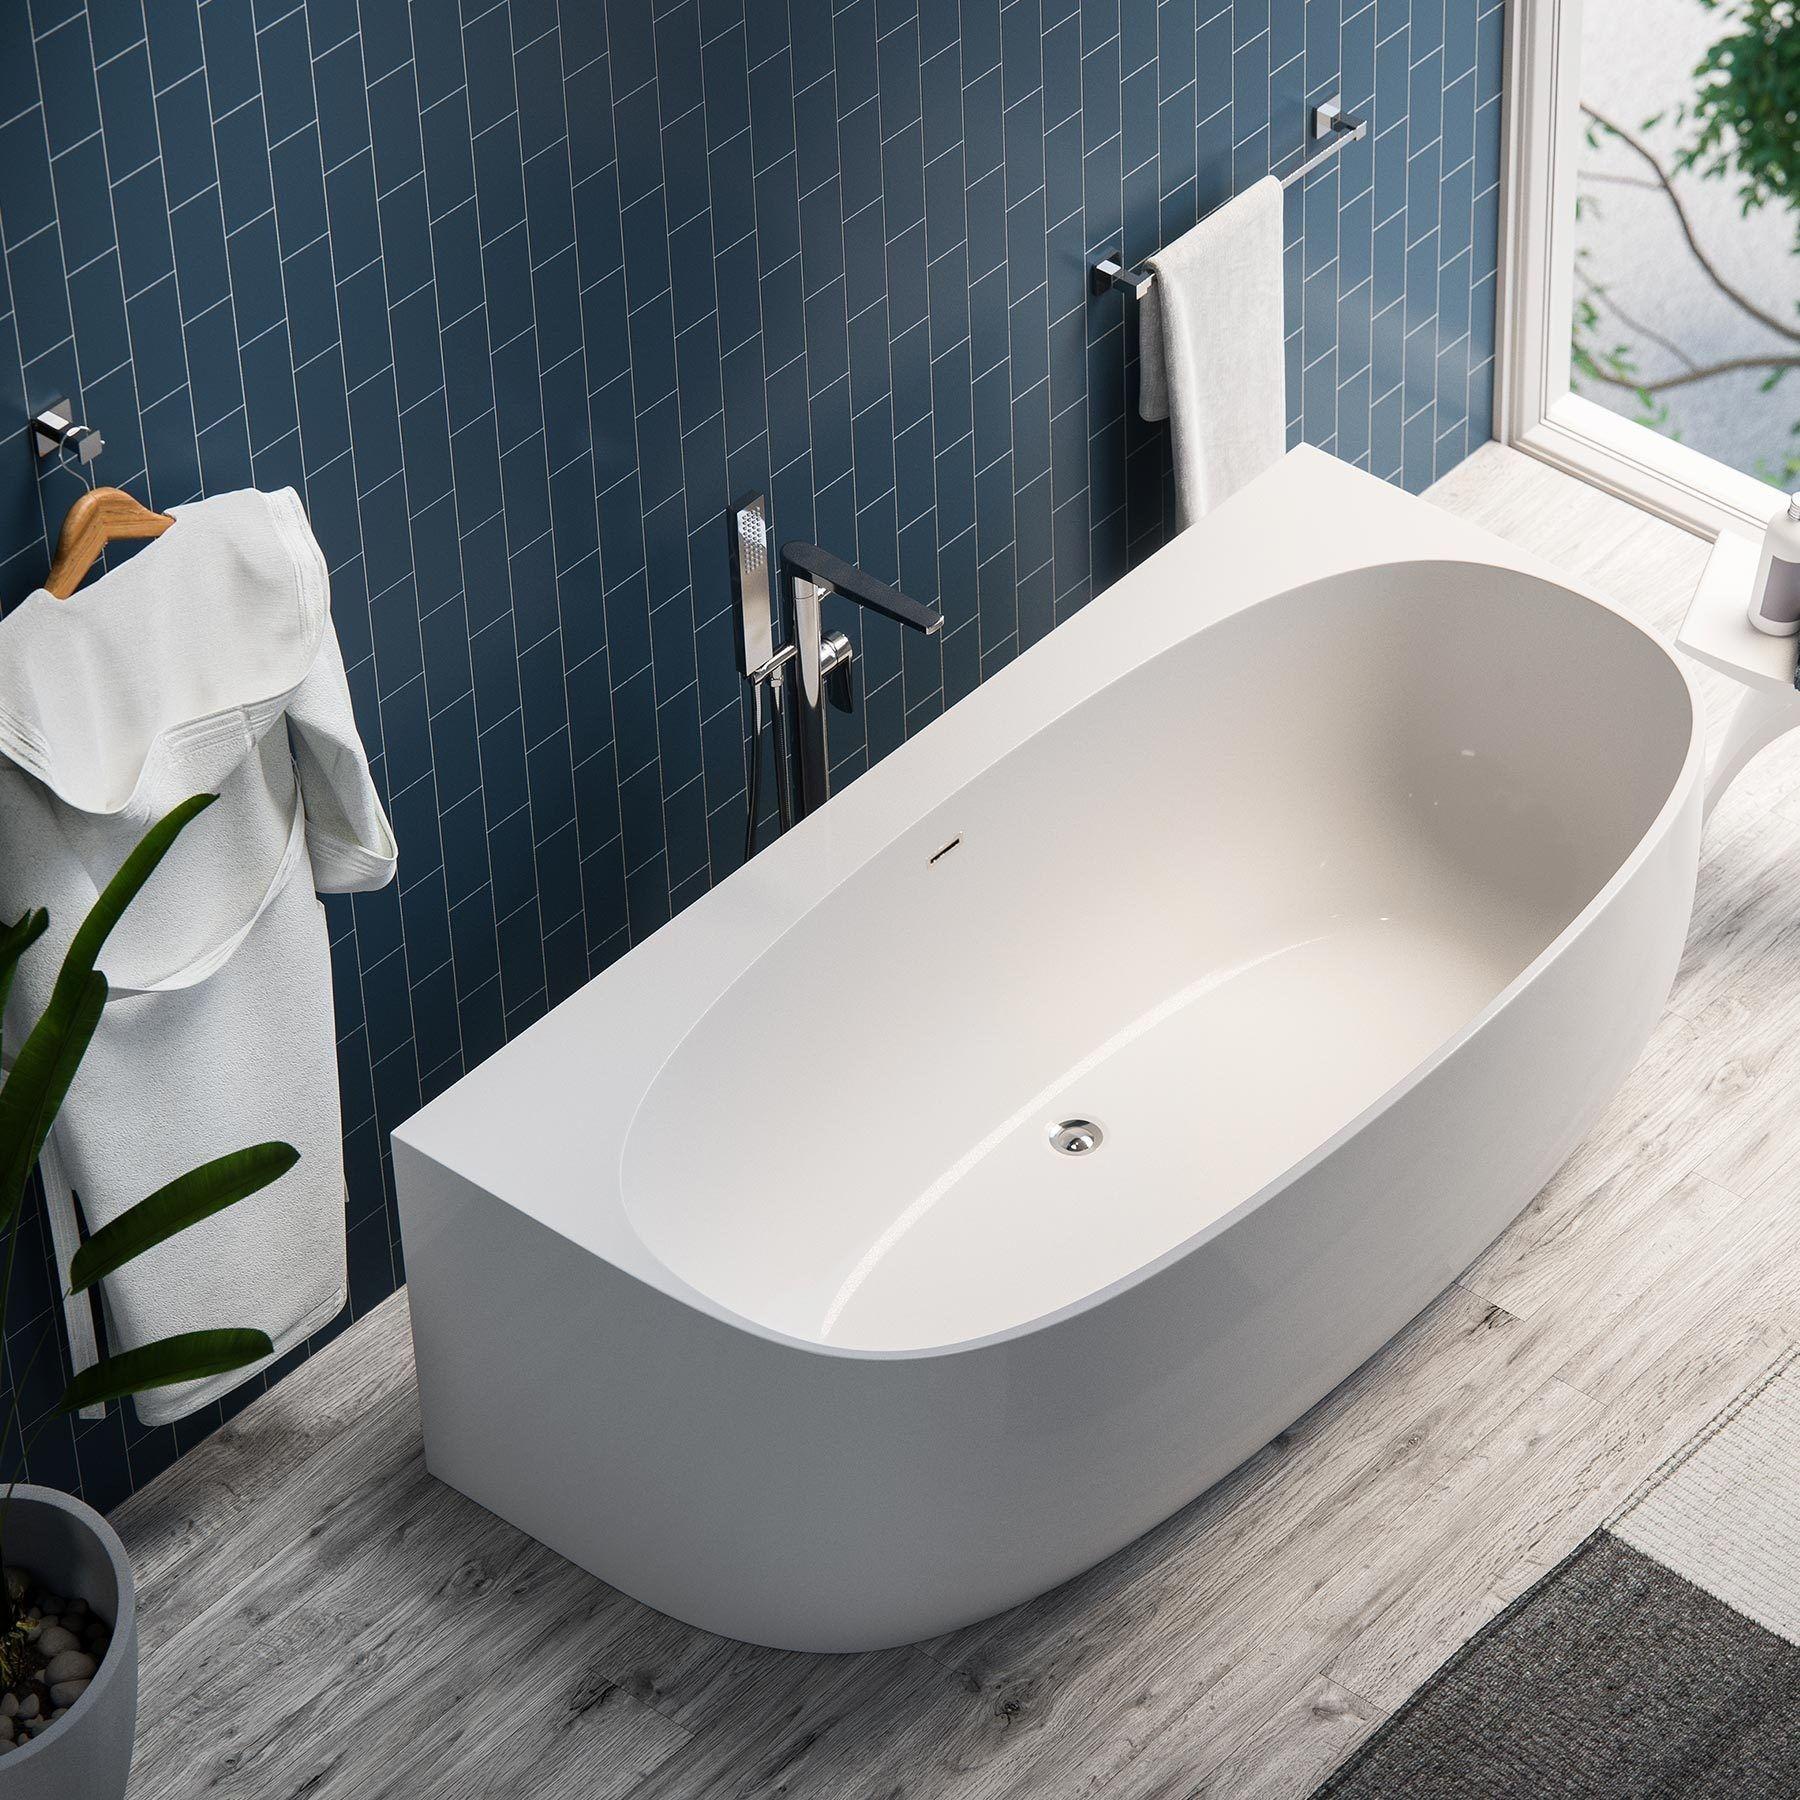 68 Ocala Freestanding Bathtub Free Standing Bath Tub Bathroom Renovation Cost Bathtub Remodel